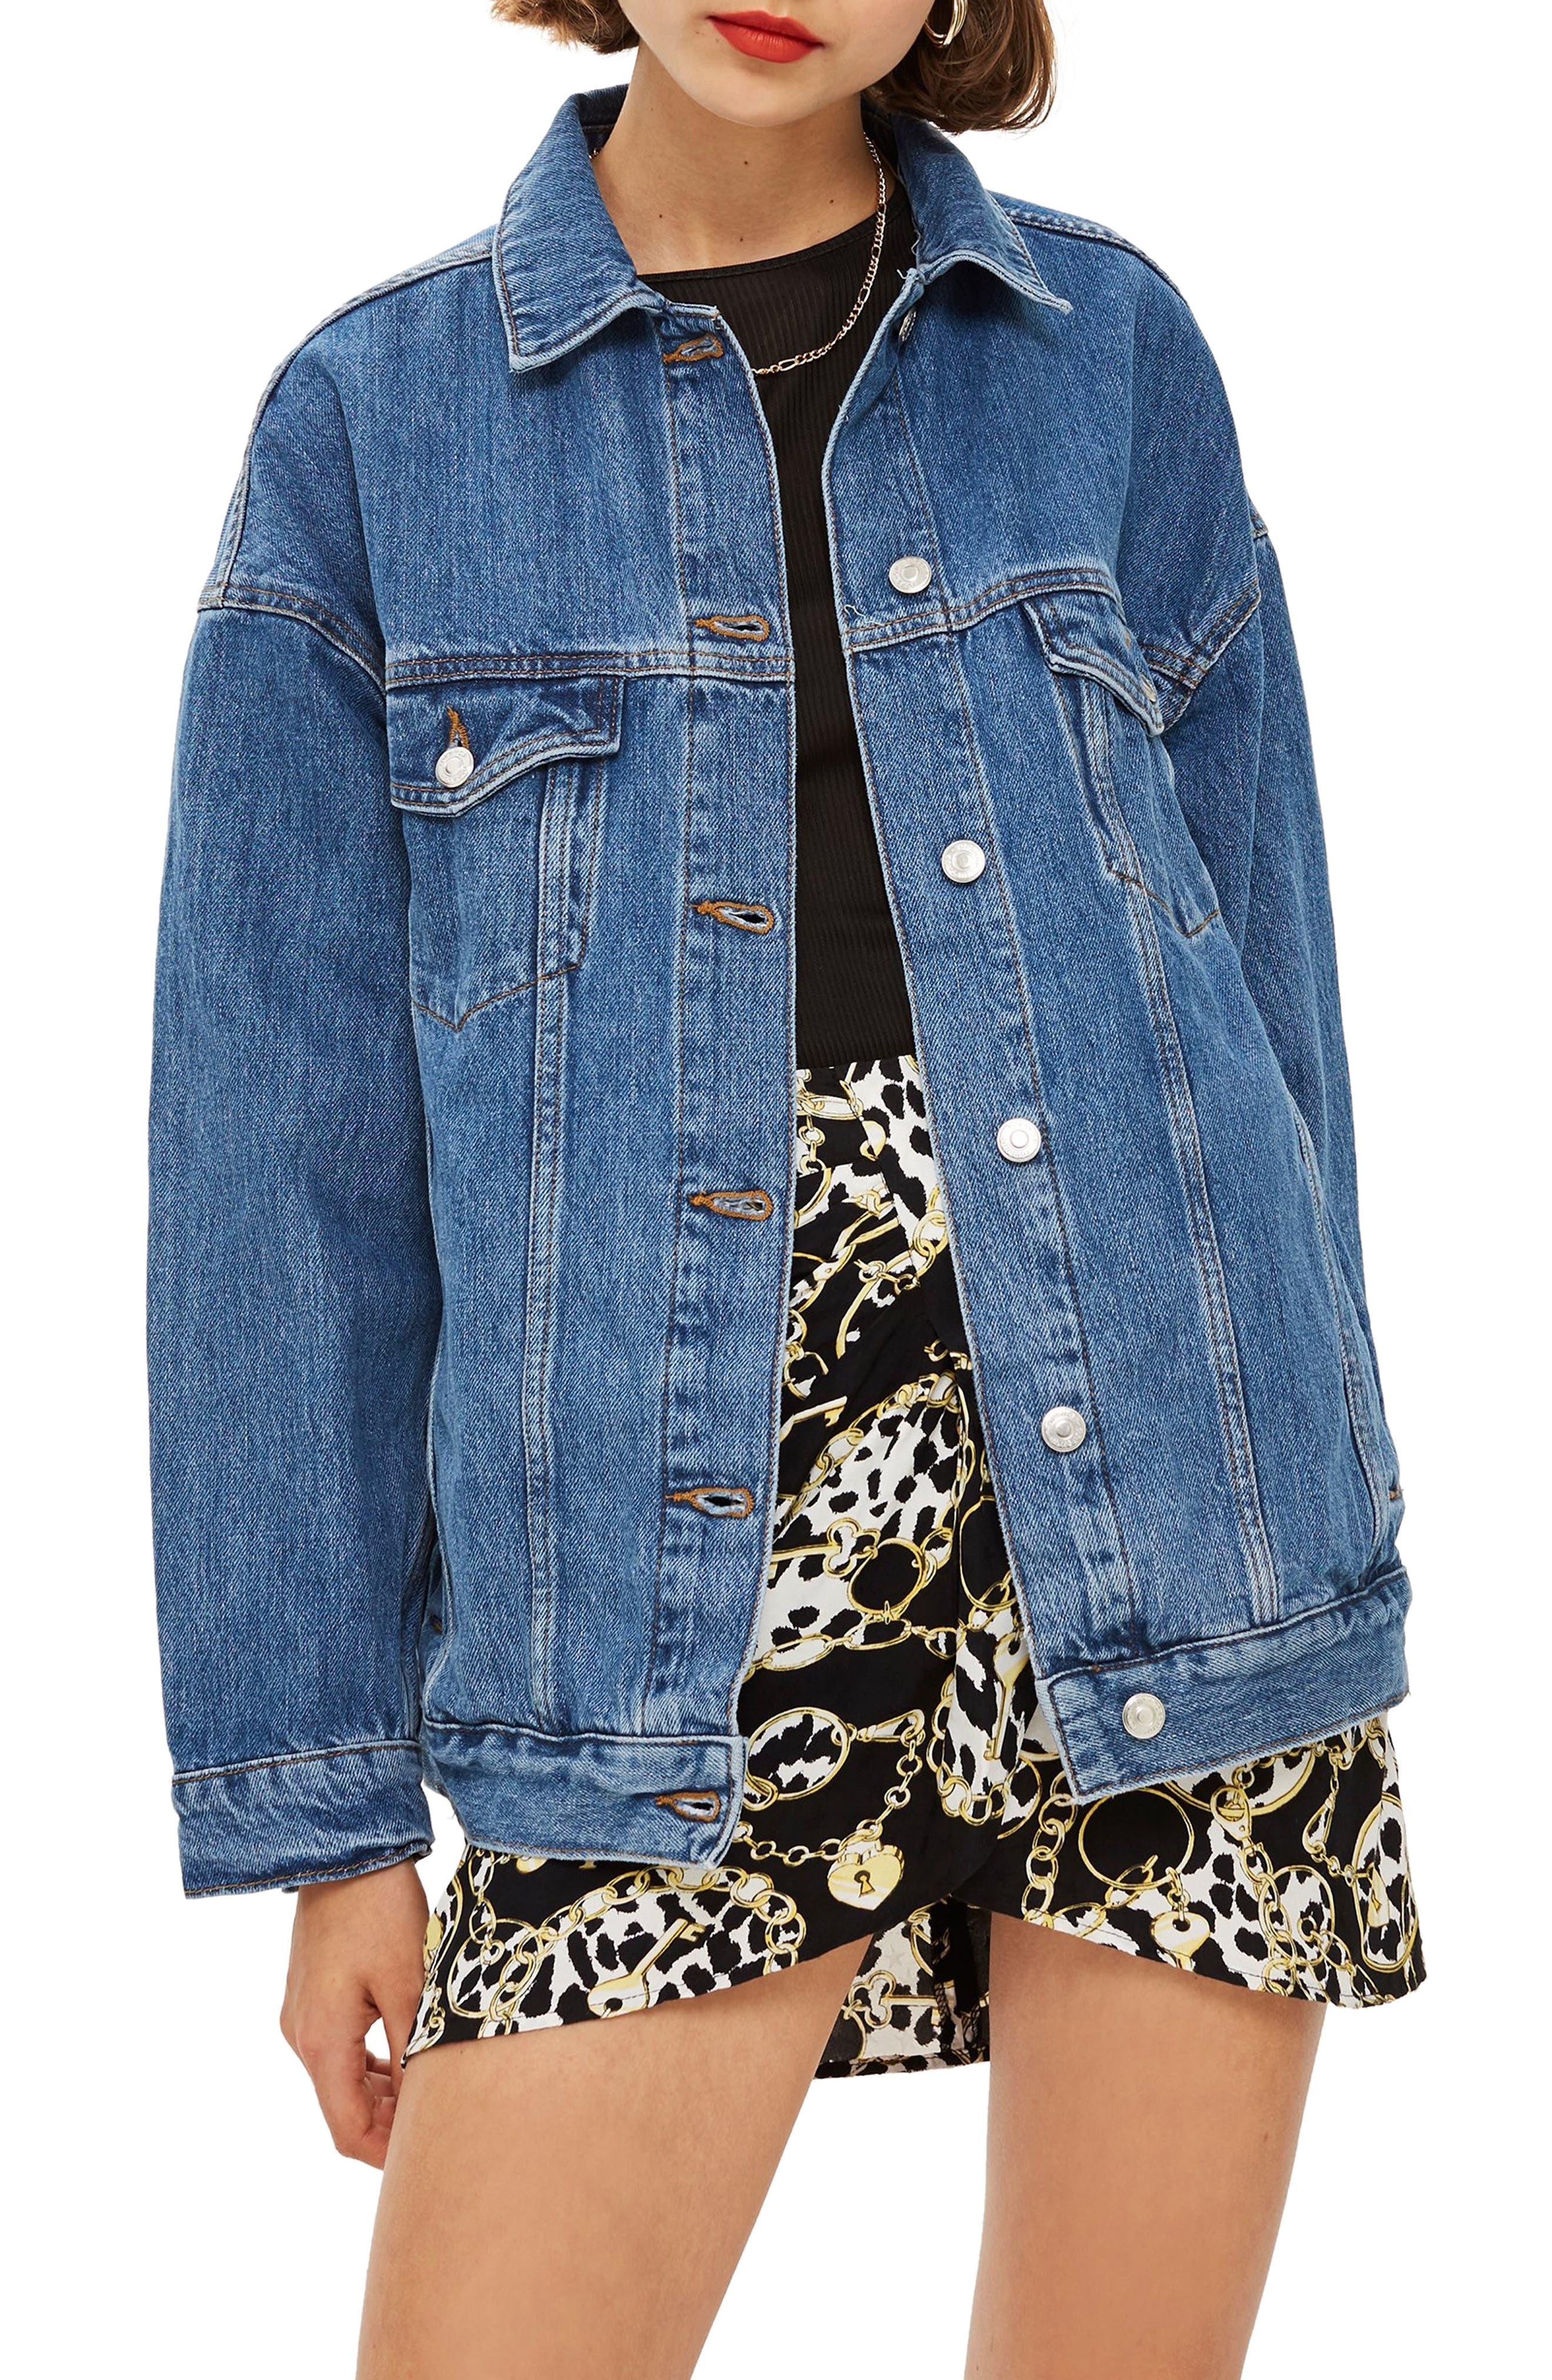 TOPSHOP, Oversized Denim Jacket, Main thumbnail 1, color, MID DENIM